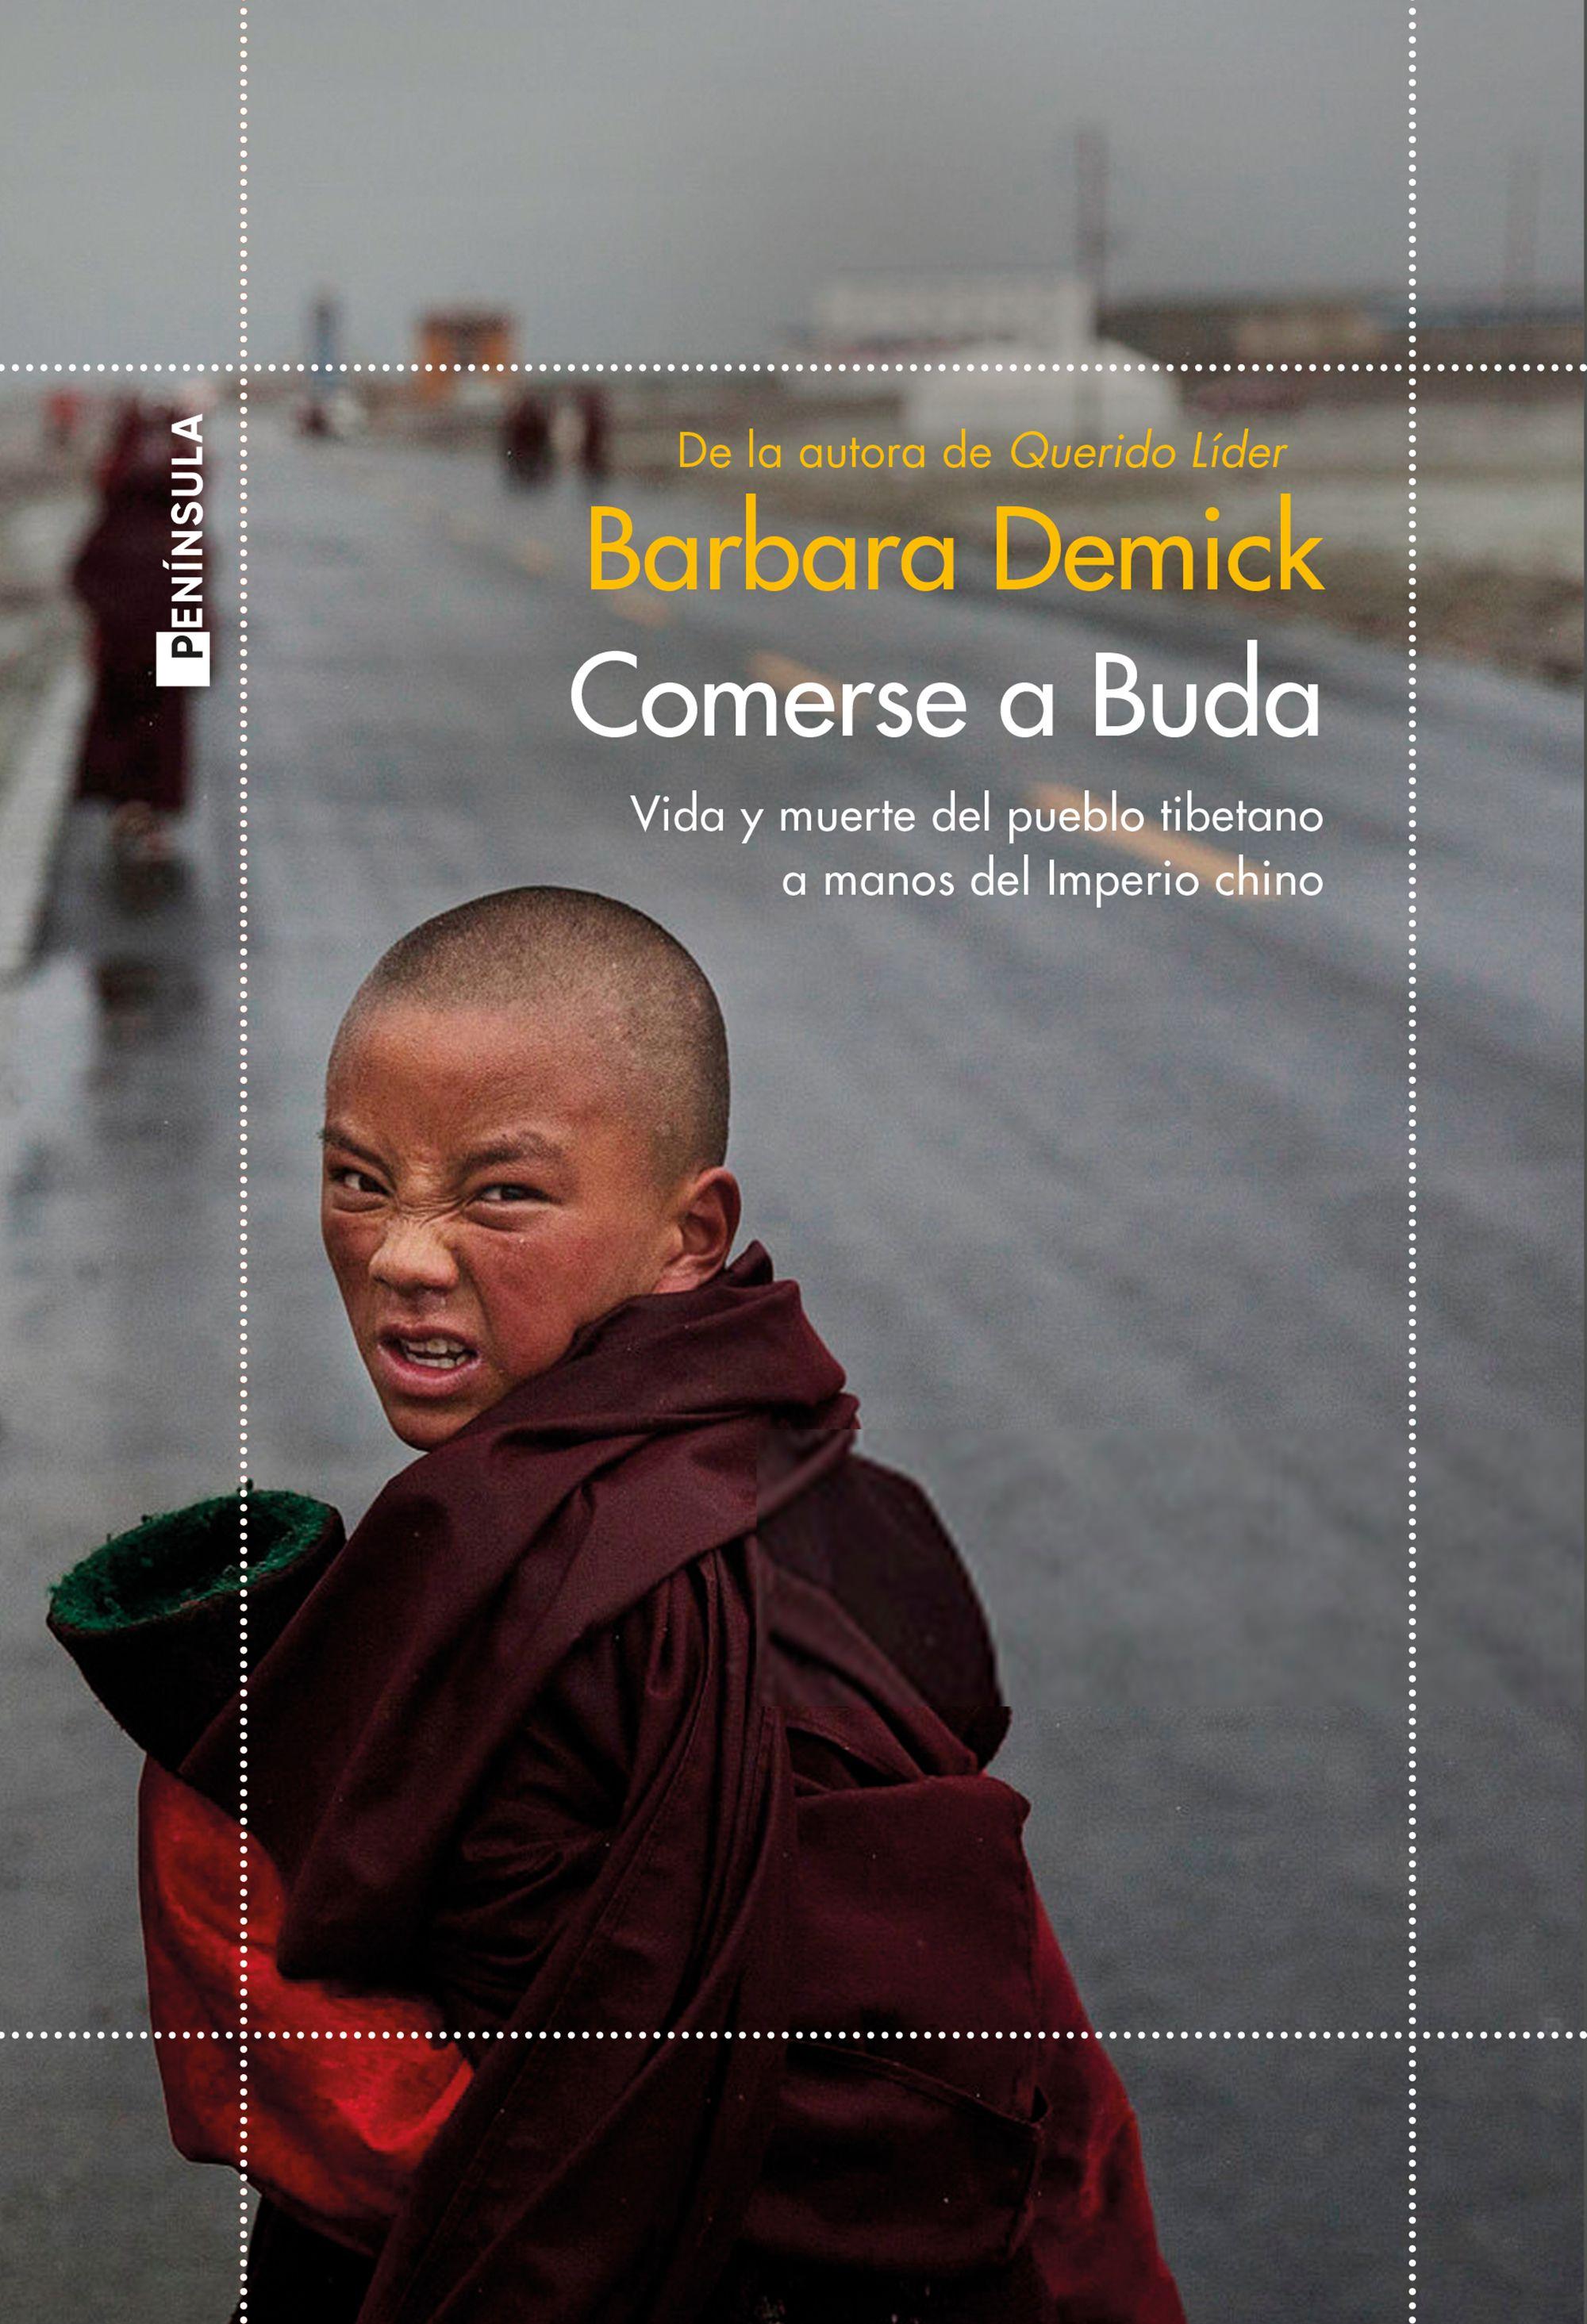 Comerse a Buda